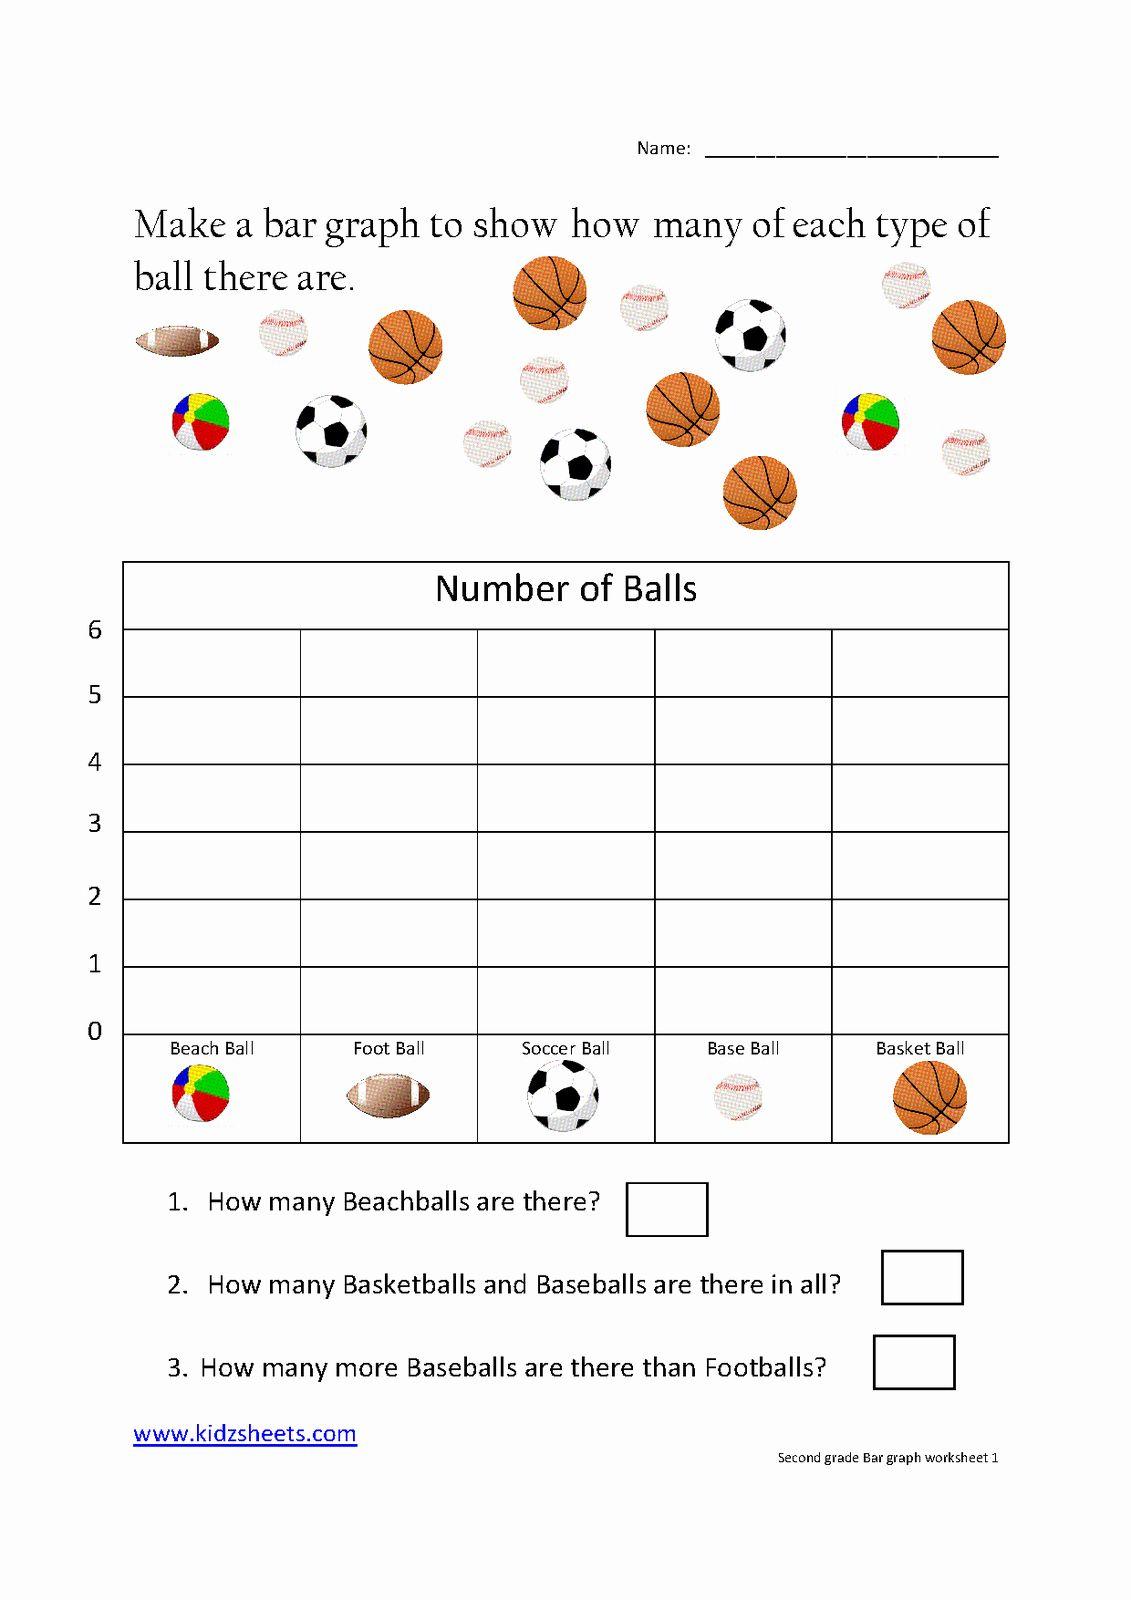 medium resolution of Free Bar Graph Worksheets Unique Kidz Worksheets Second Grade Bar Graph  Worksheet1   Graphing worksheets